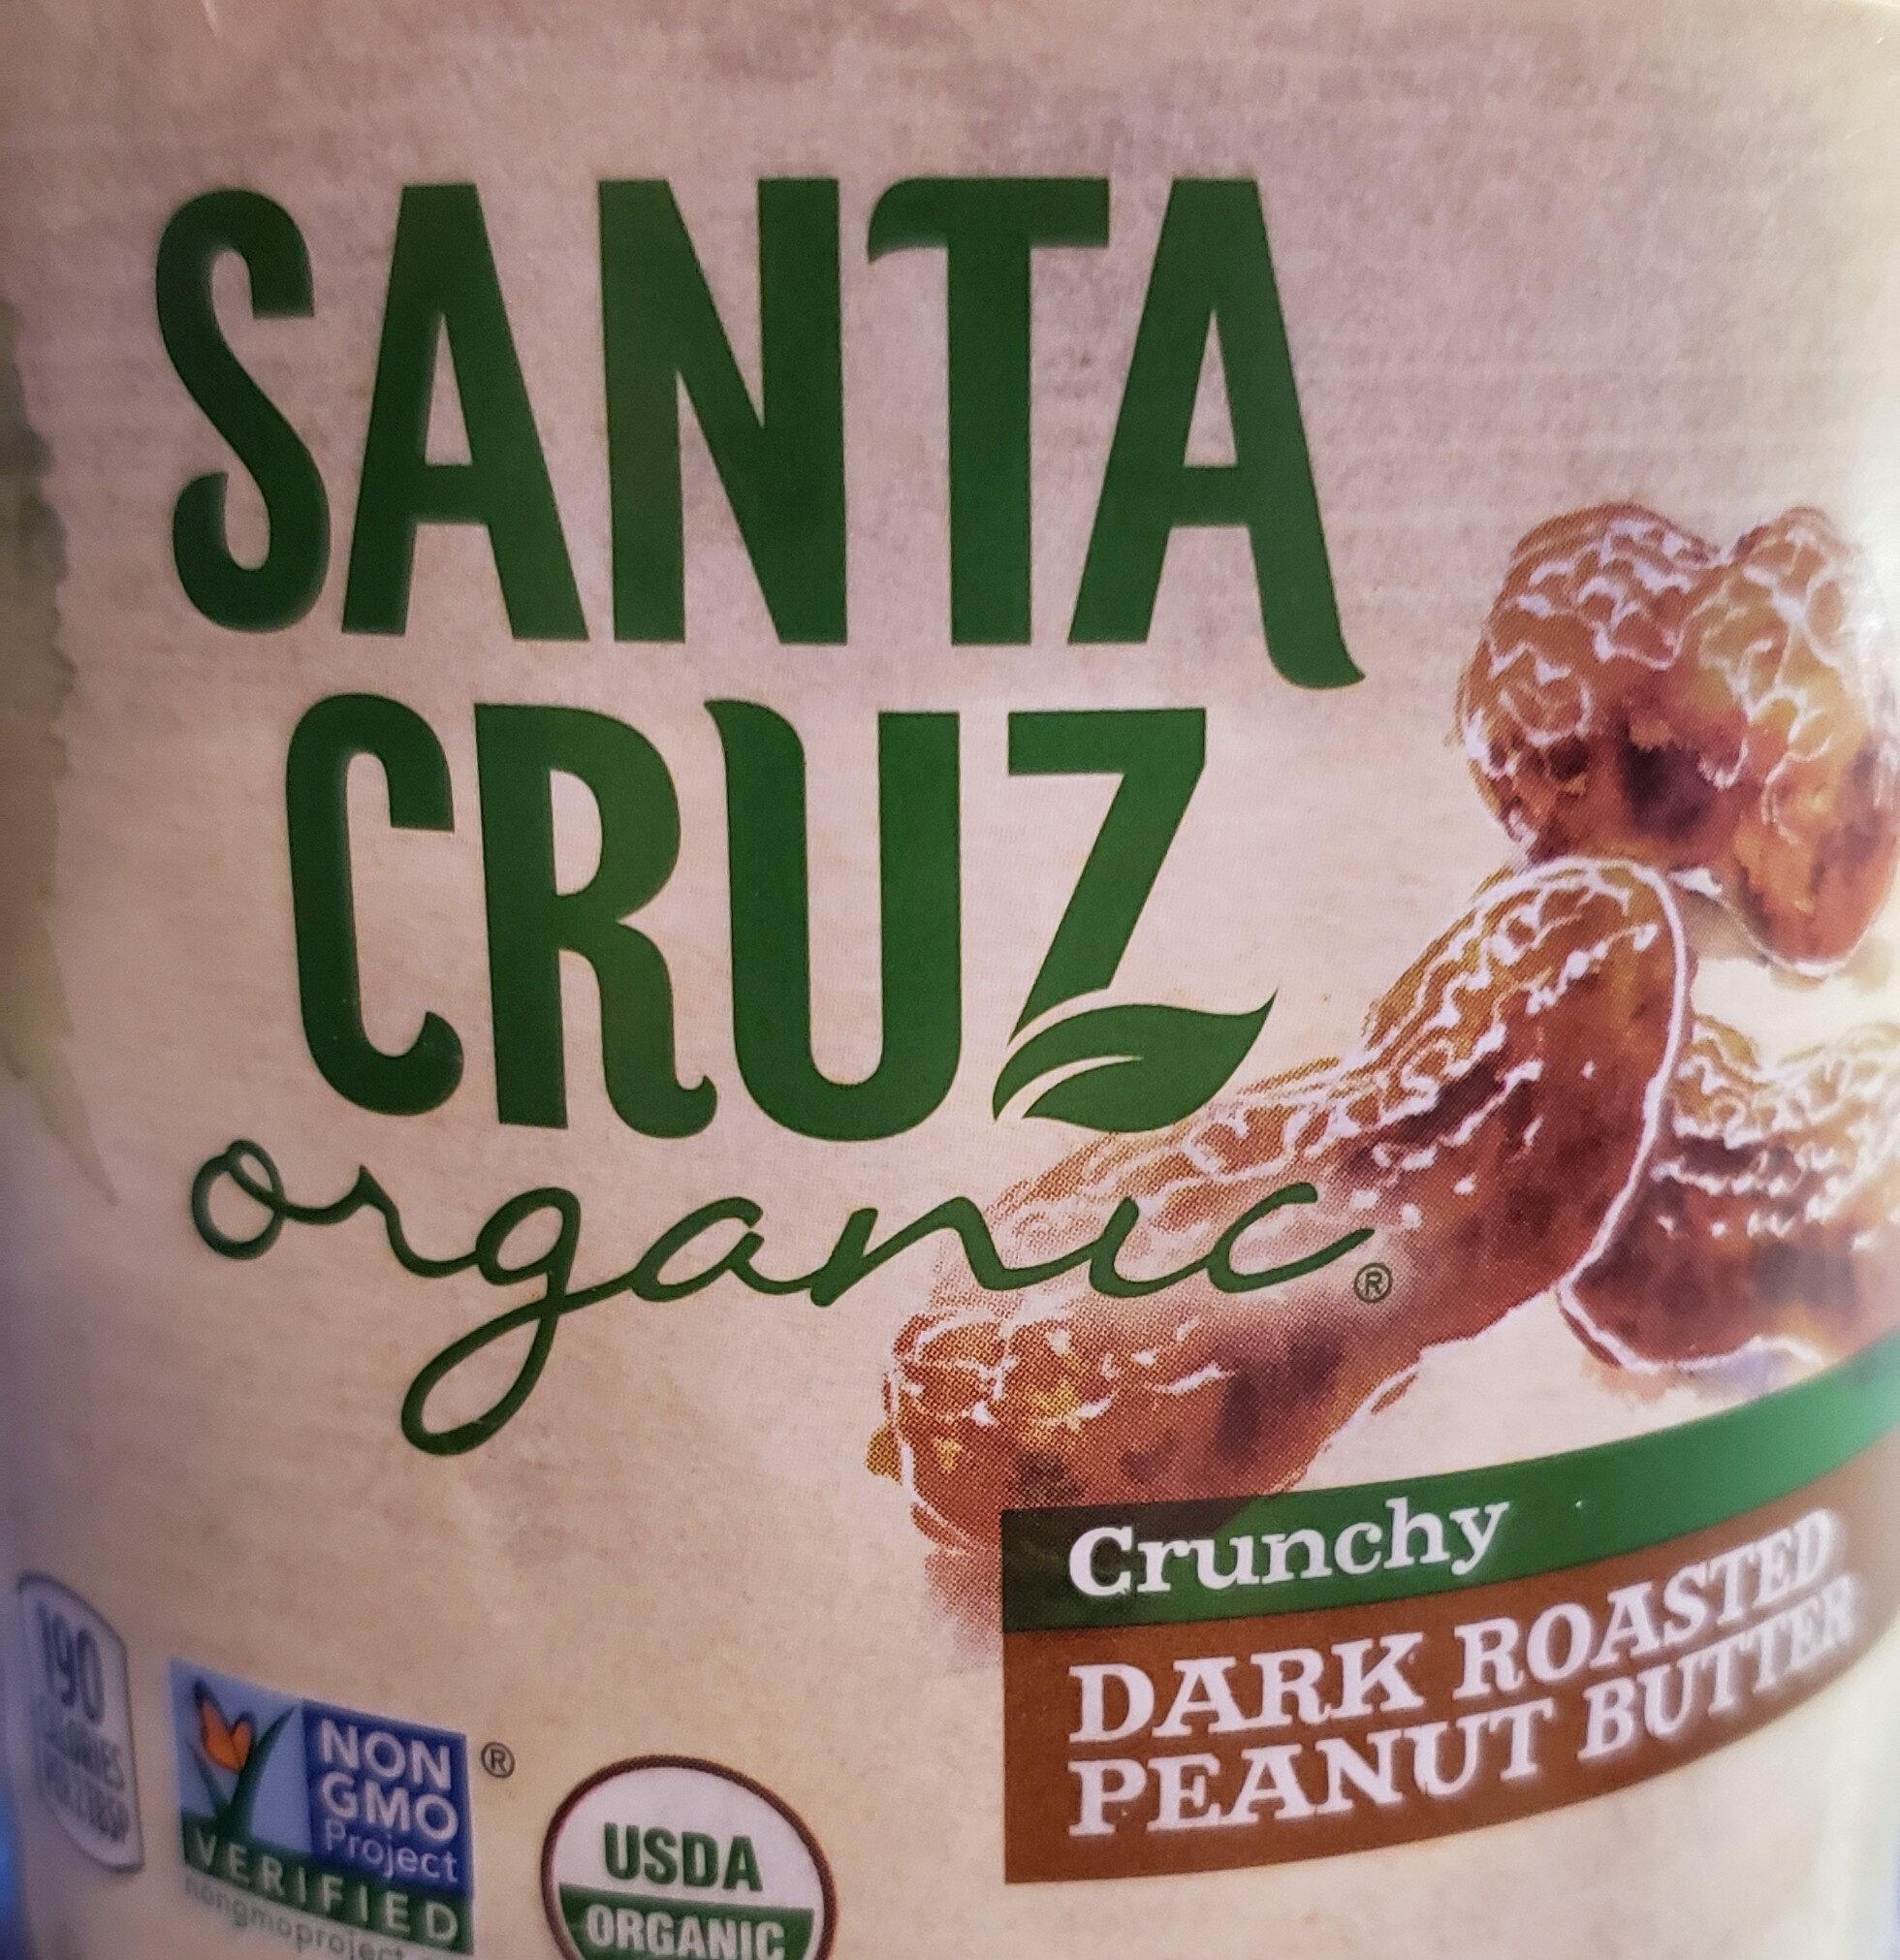 Santa cruz, organic crunchy dark roasted peanut butter, crunchy dark roasted - Product - en